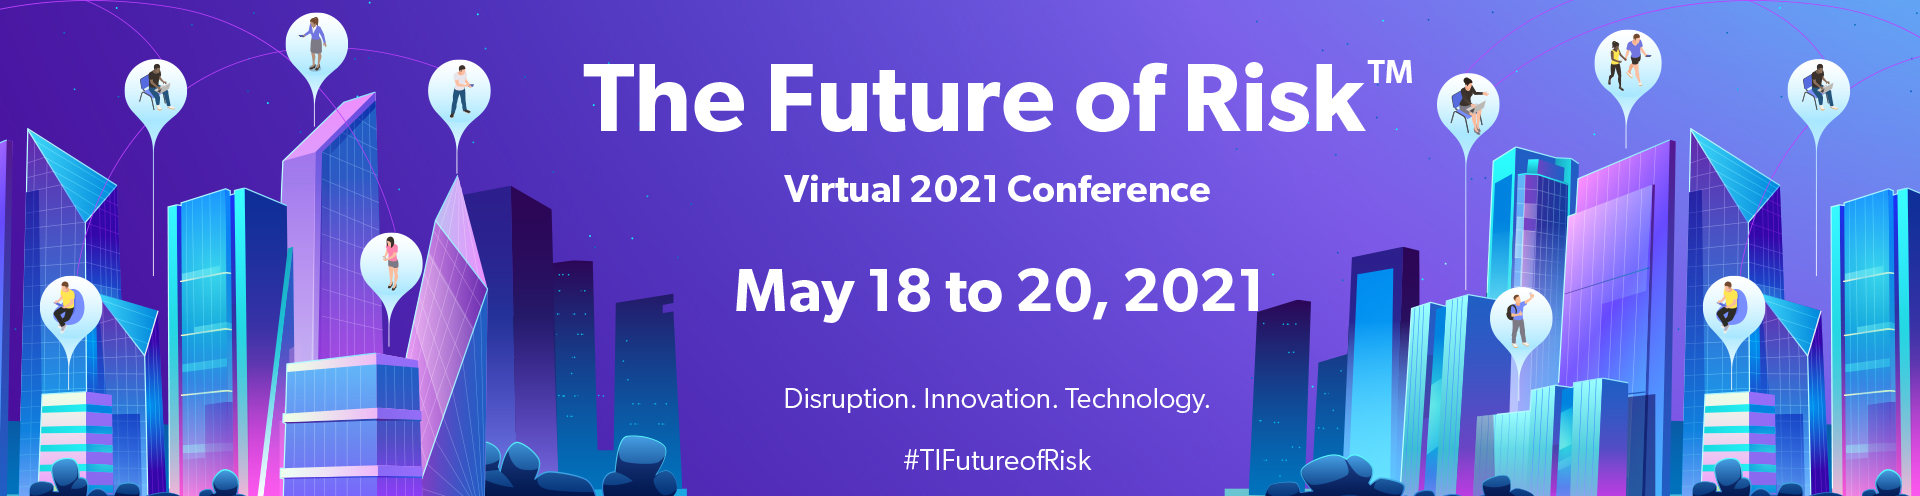 The Future of Risk Virtual Conference 2021